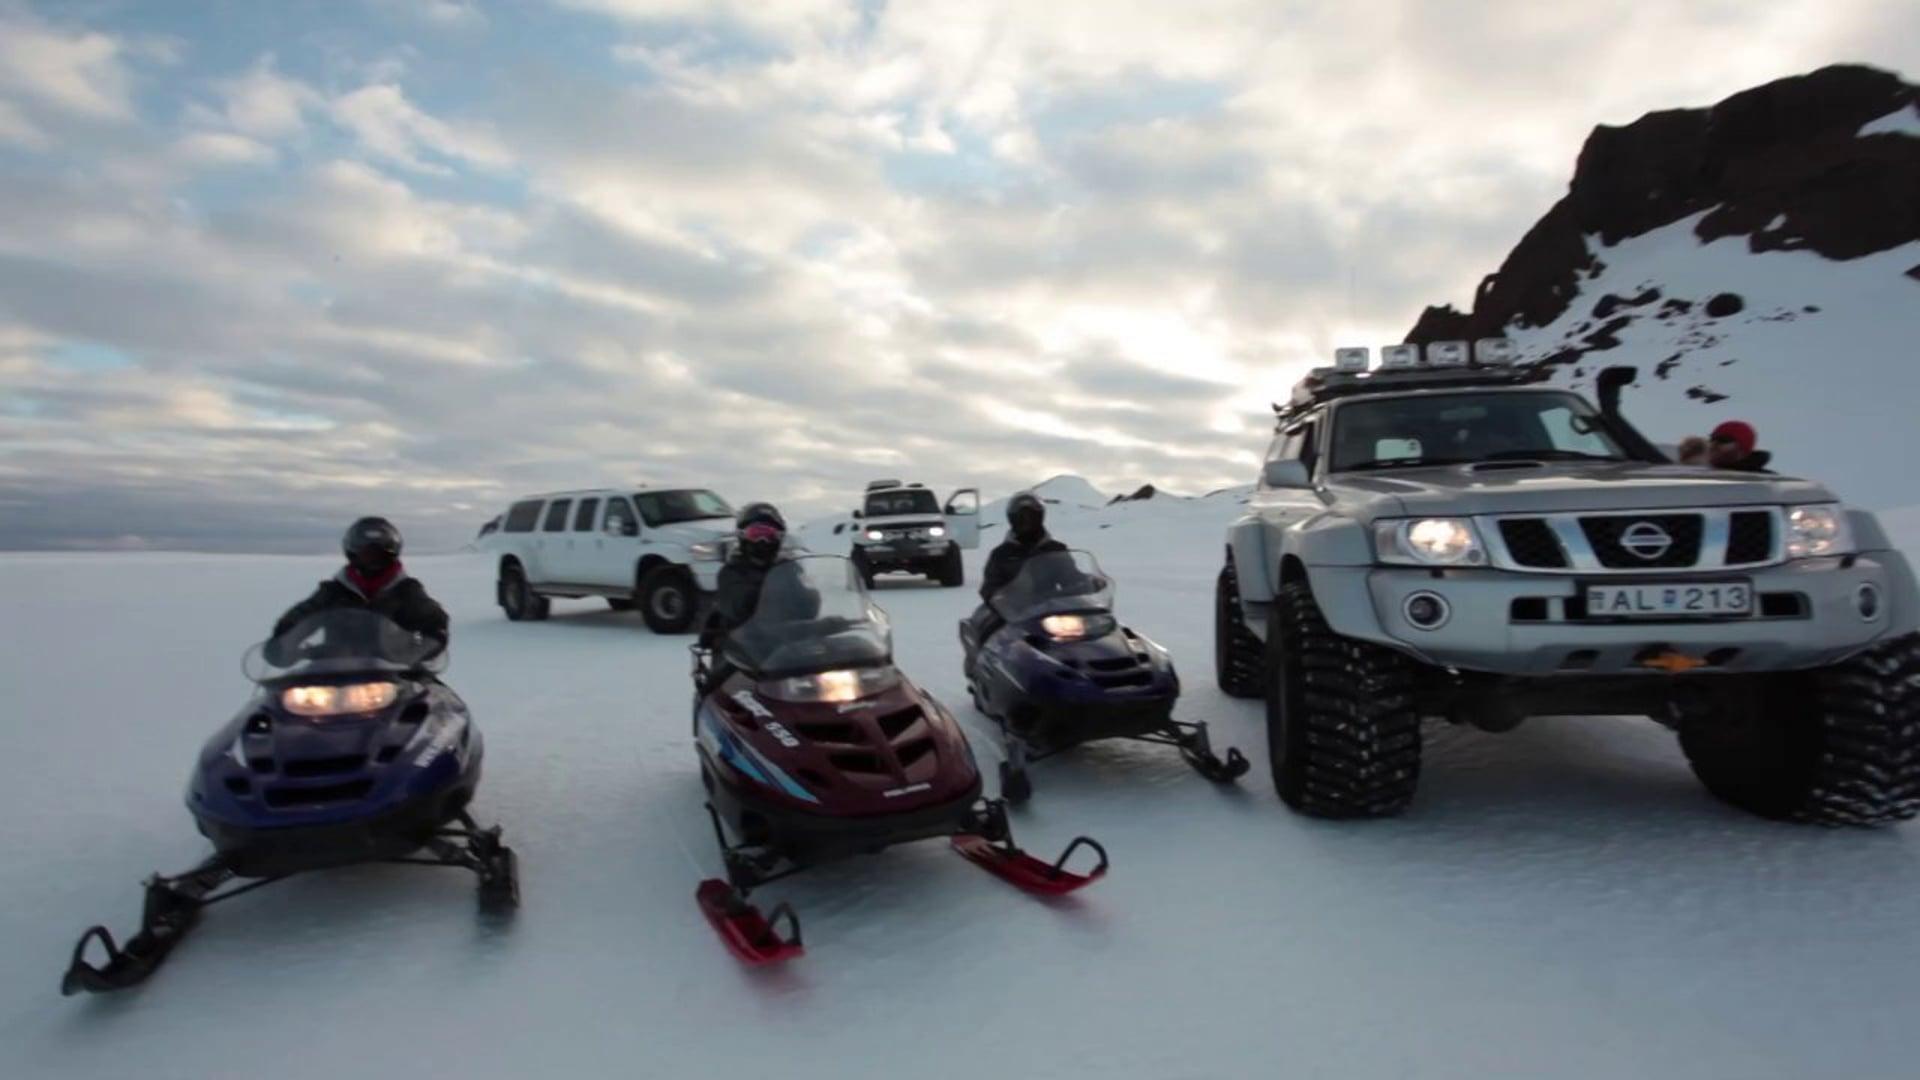 Iceland winter safari!